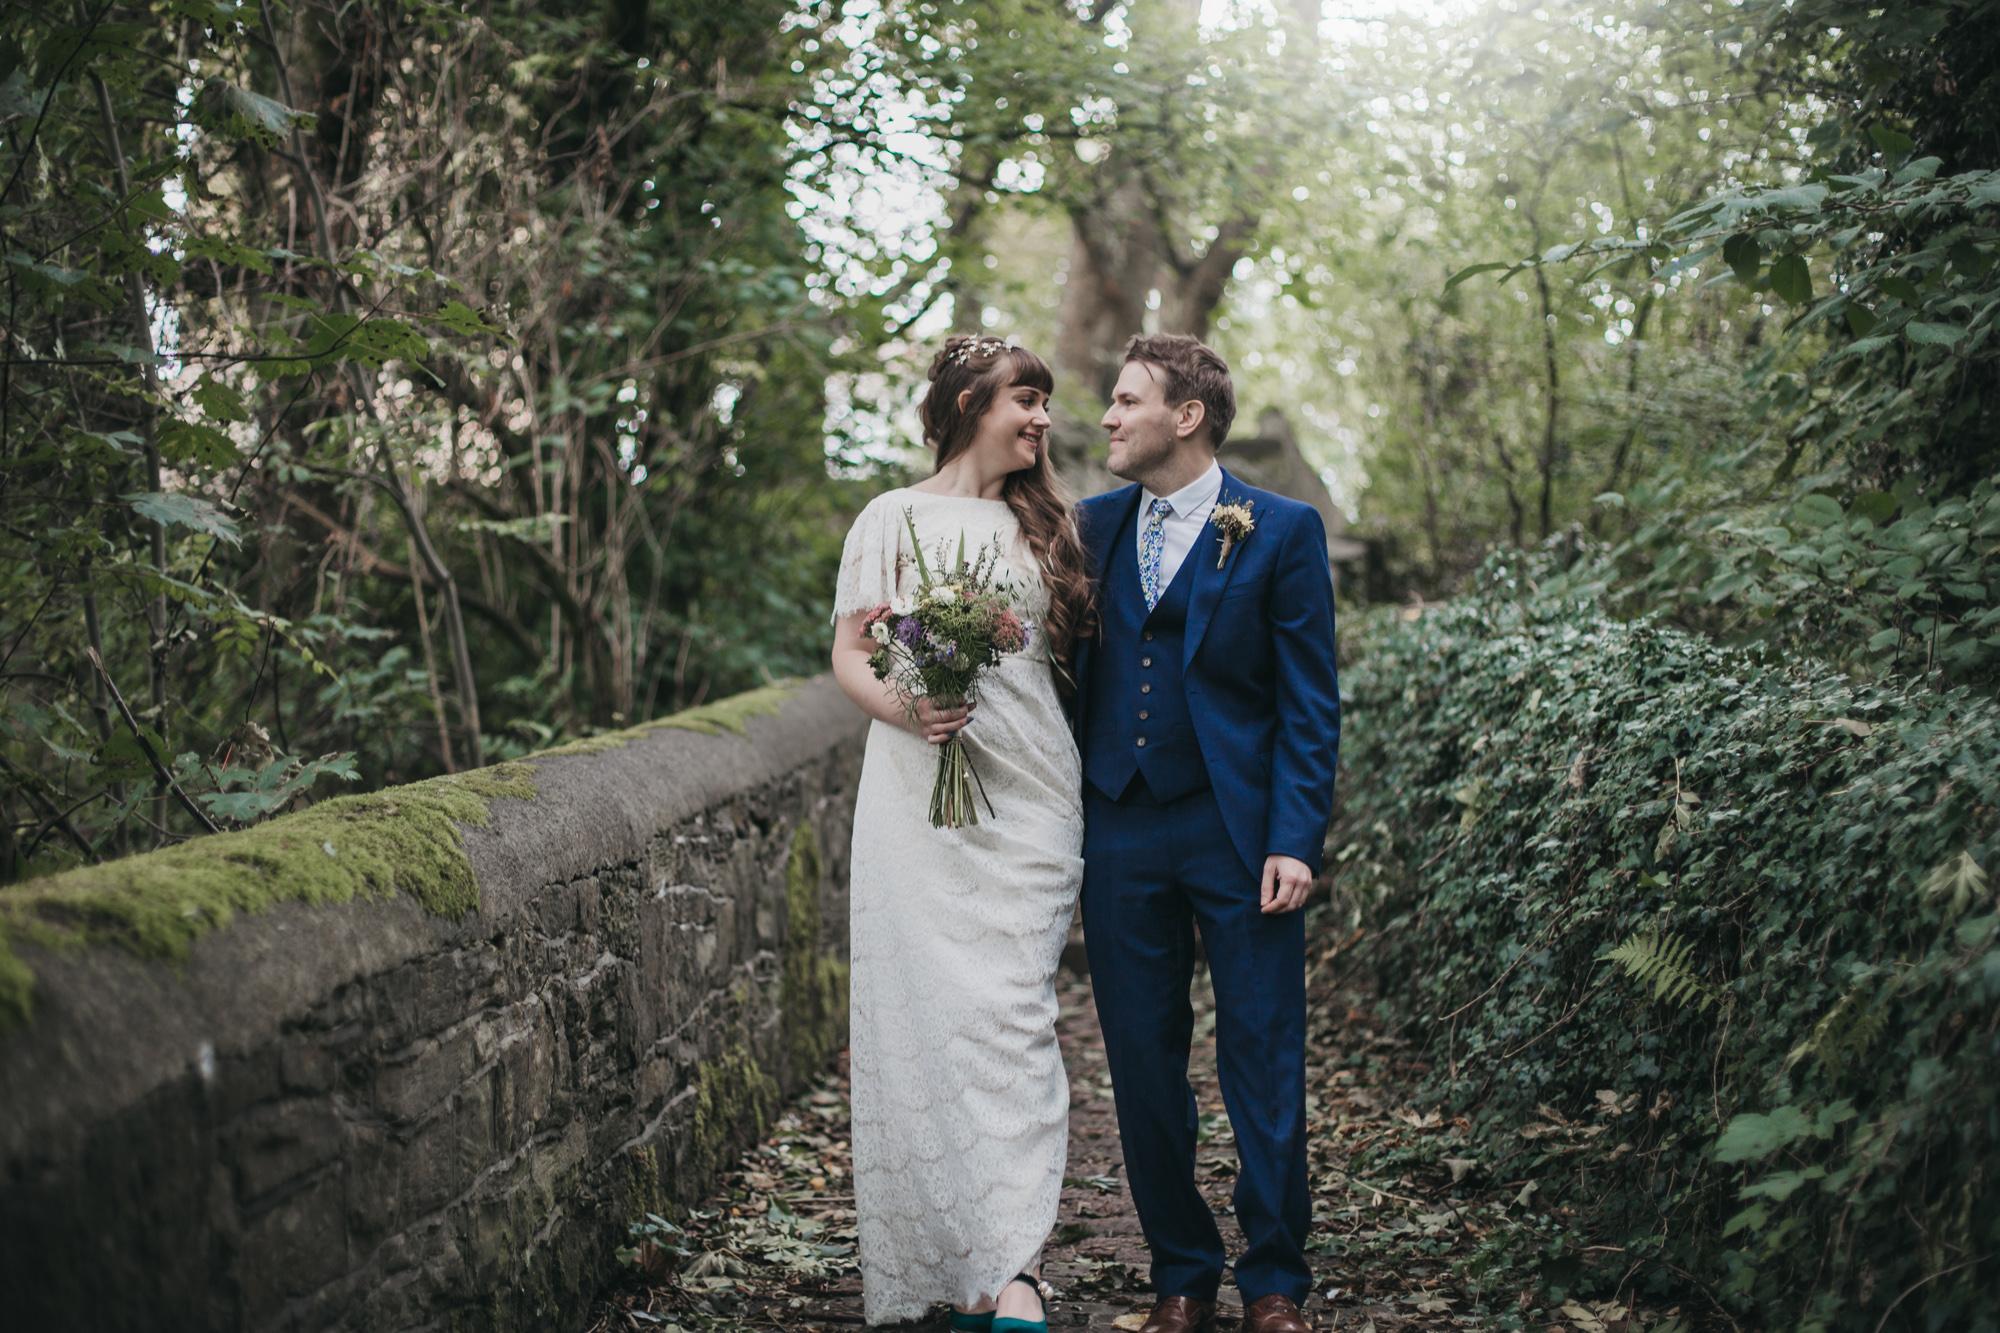 Kristy-Back-Garden-Outdoor-Wedding-Sheffield-Industrial-Warehouse-Wedding-Bohemian-Kate-Beaumont-Dahlia-Dress-23.jpg